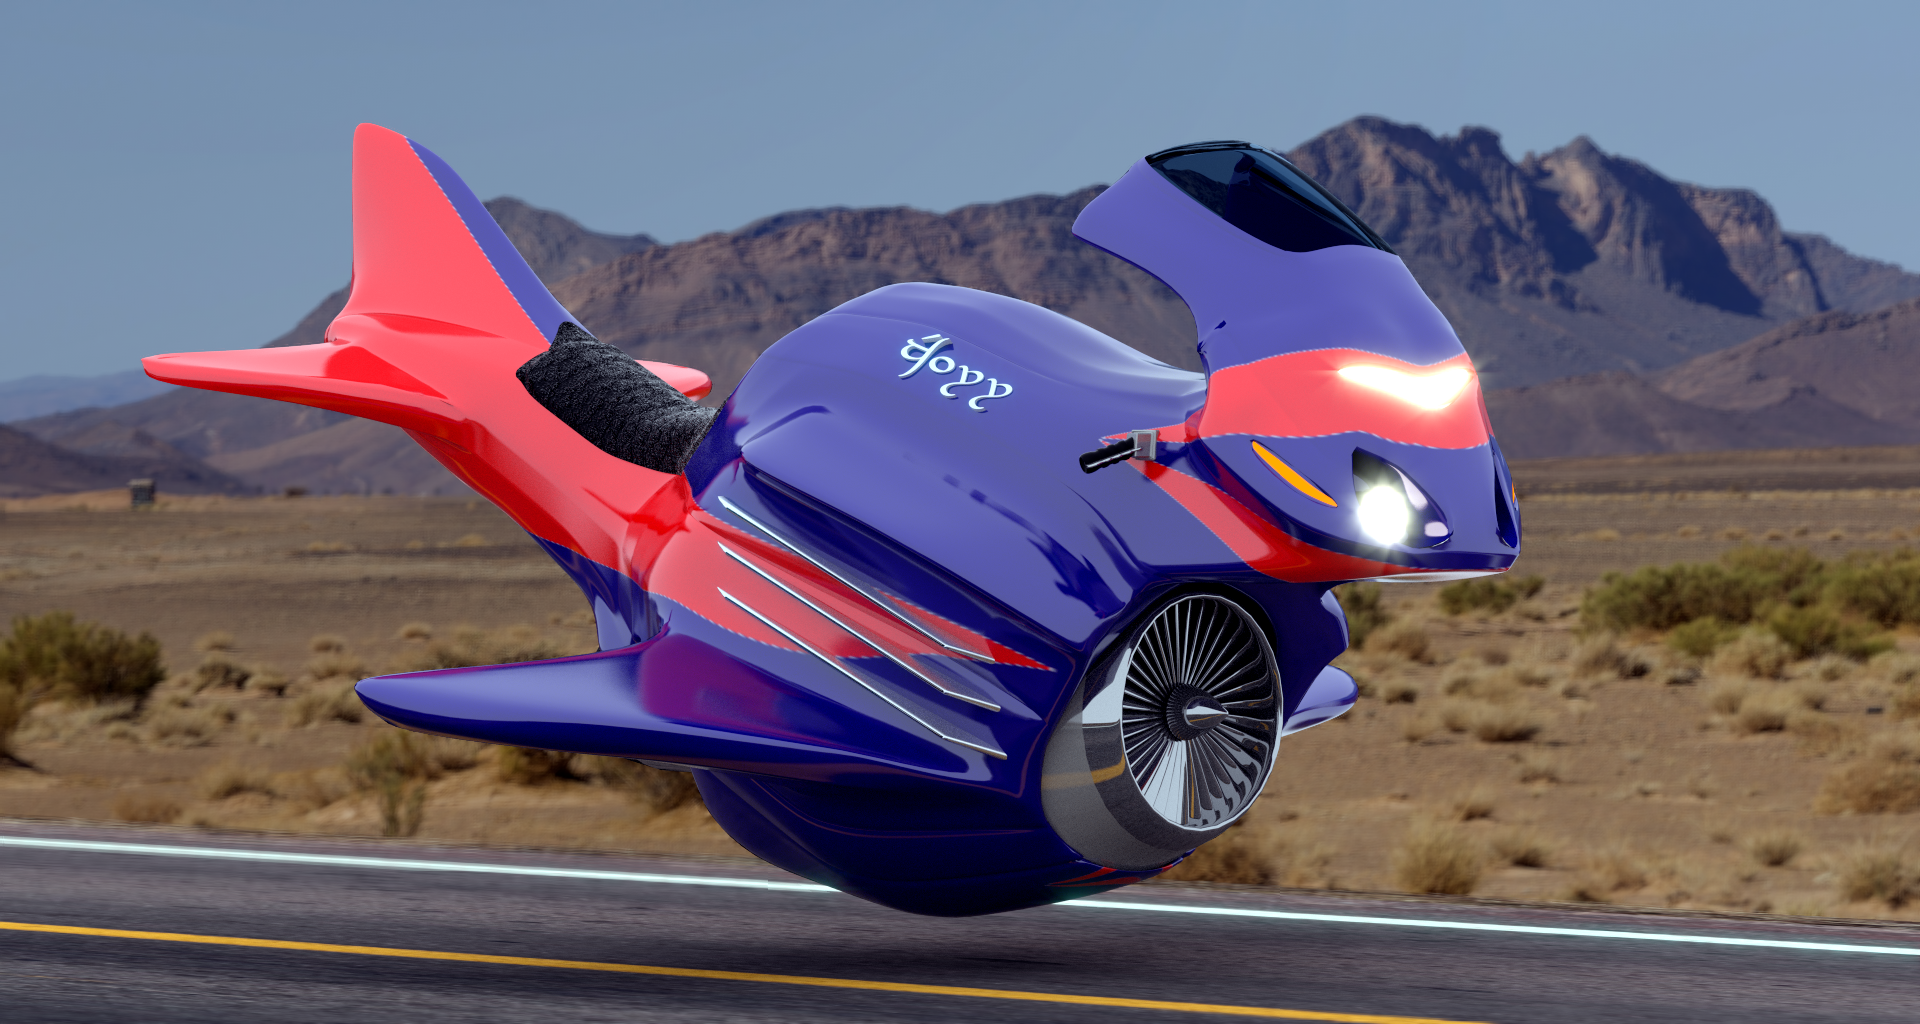 glisseur moto futuriste by geek3dfr. Black Bedroom Furniture Sets. Home Design Ideas